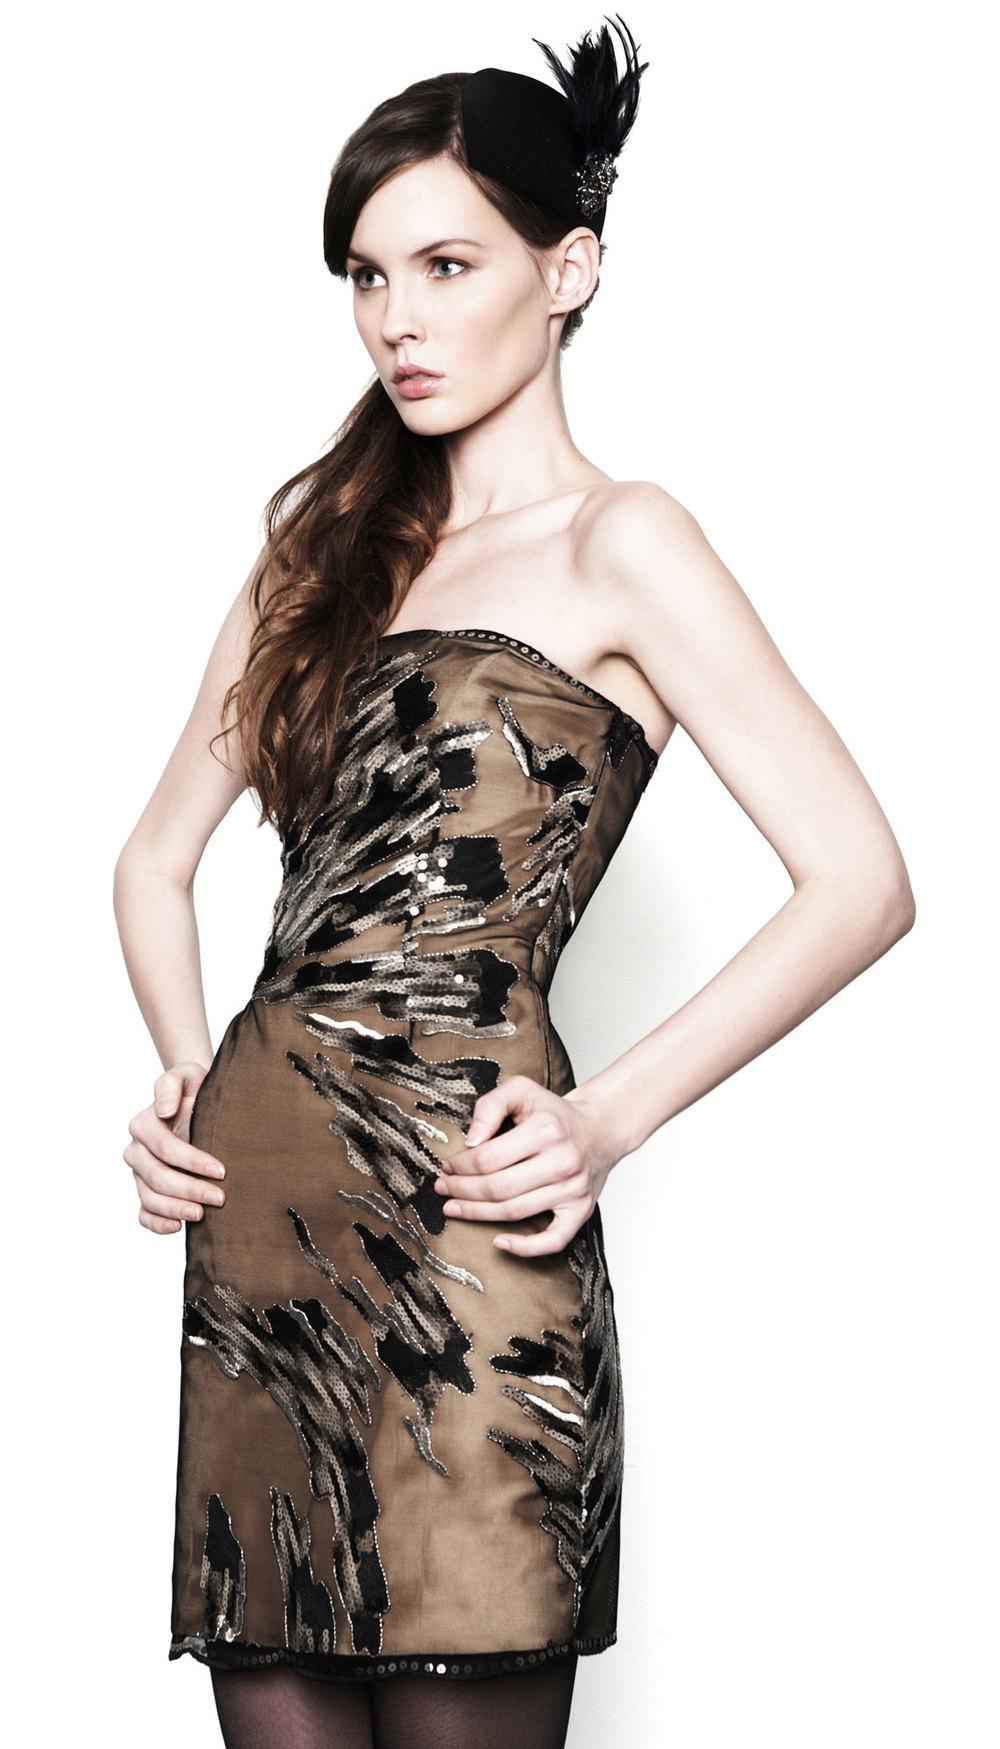 Z-Form-Uniform-Kelsy-Zimba-Dress-WD8.jpg